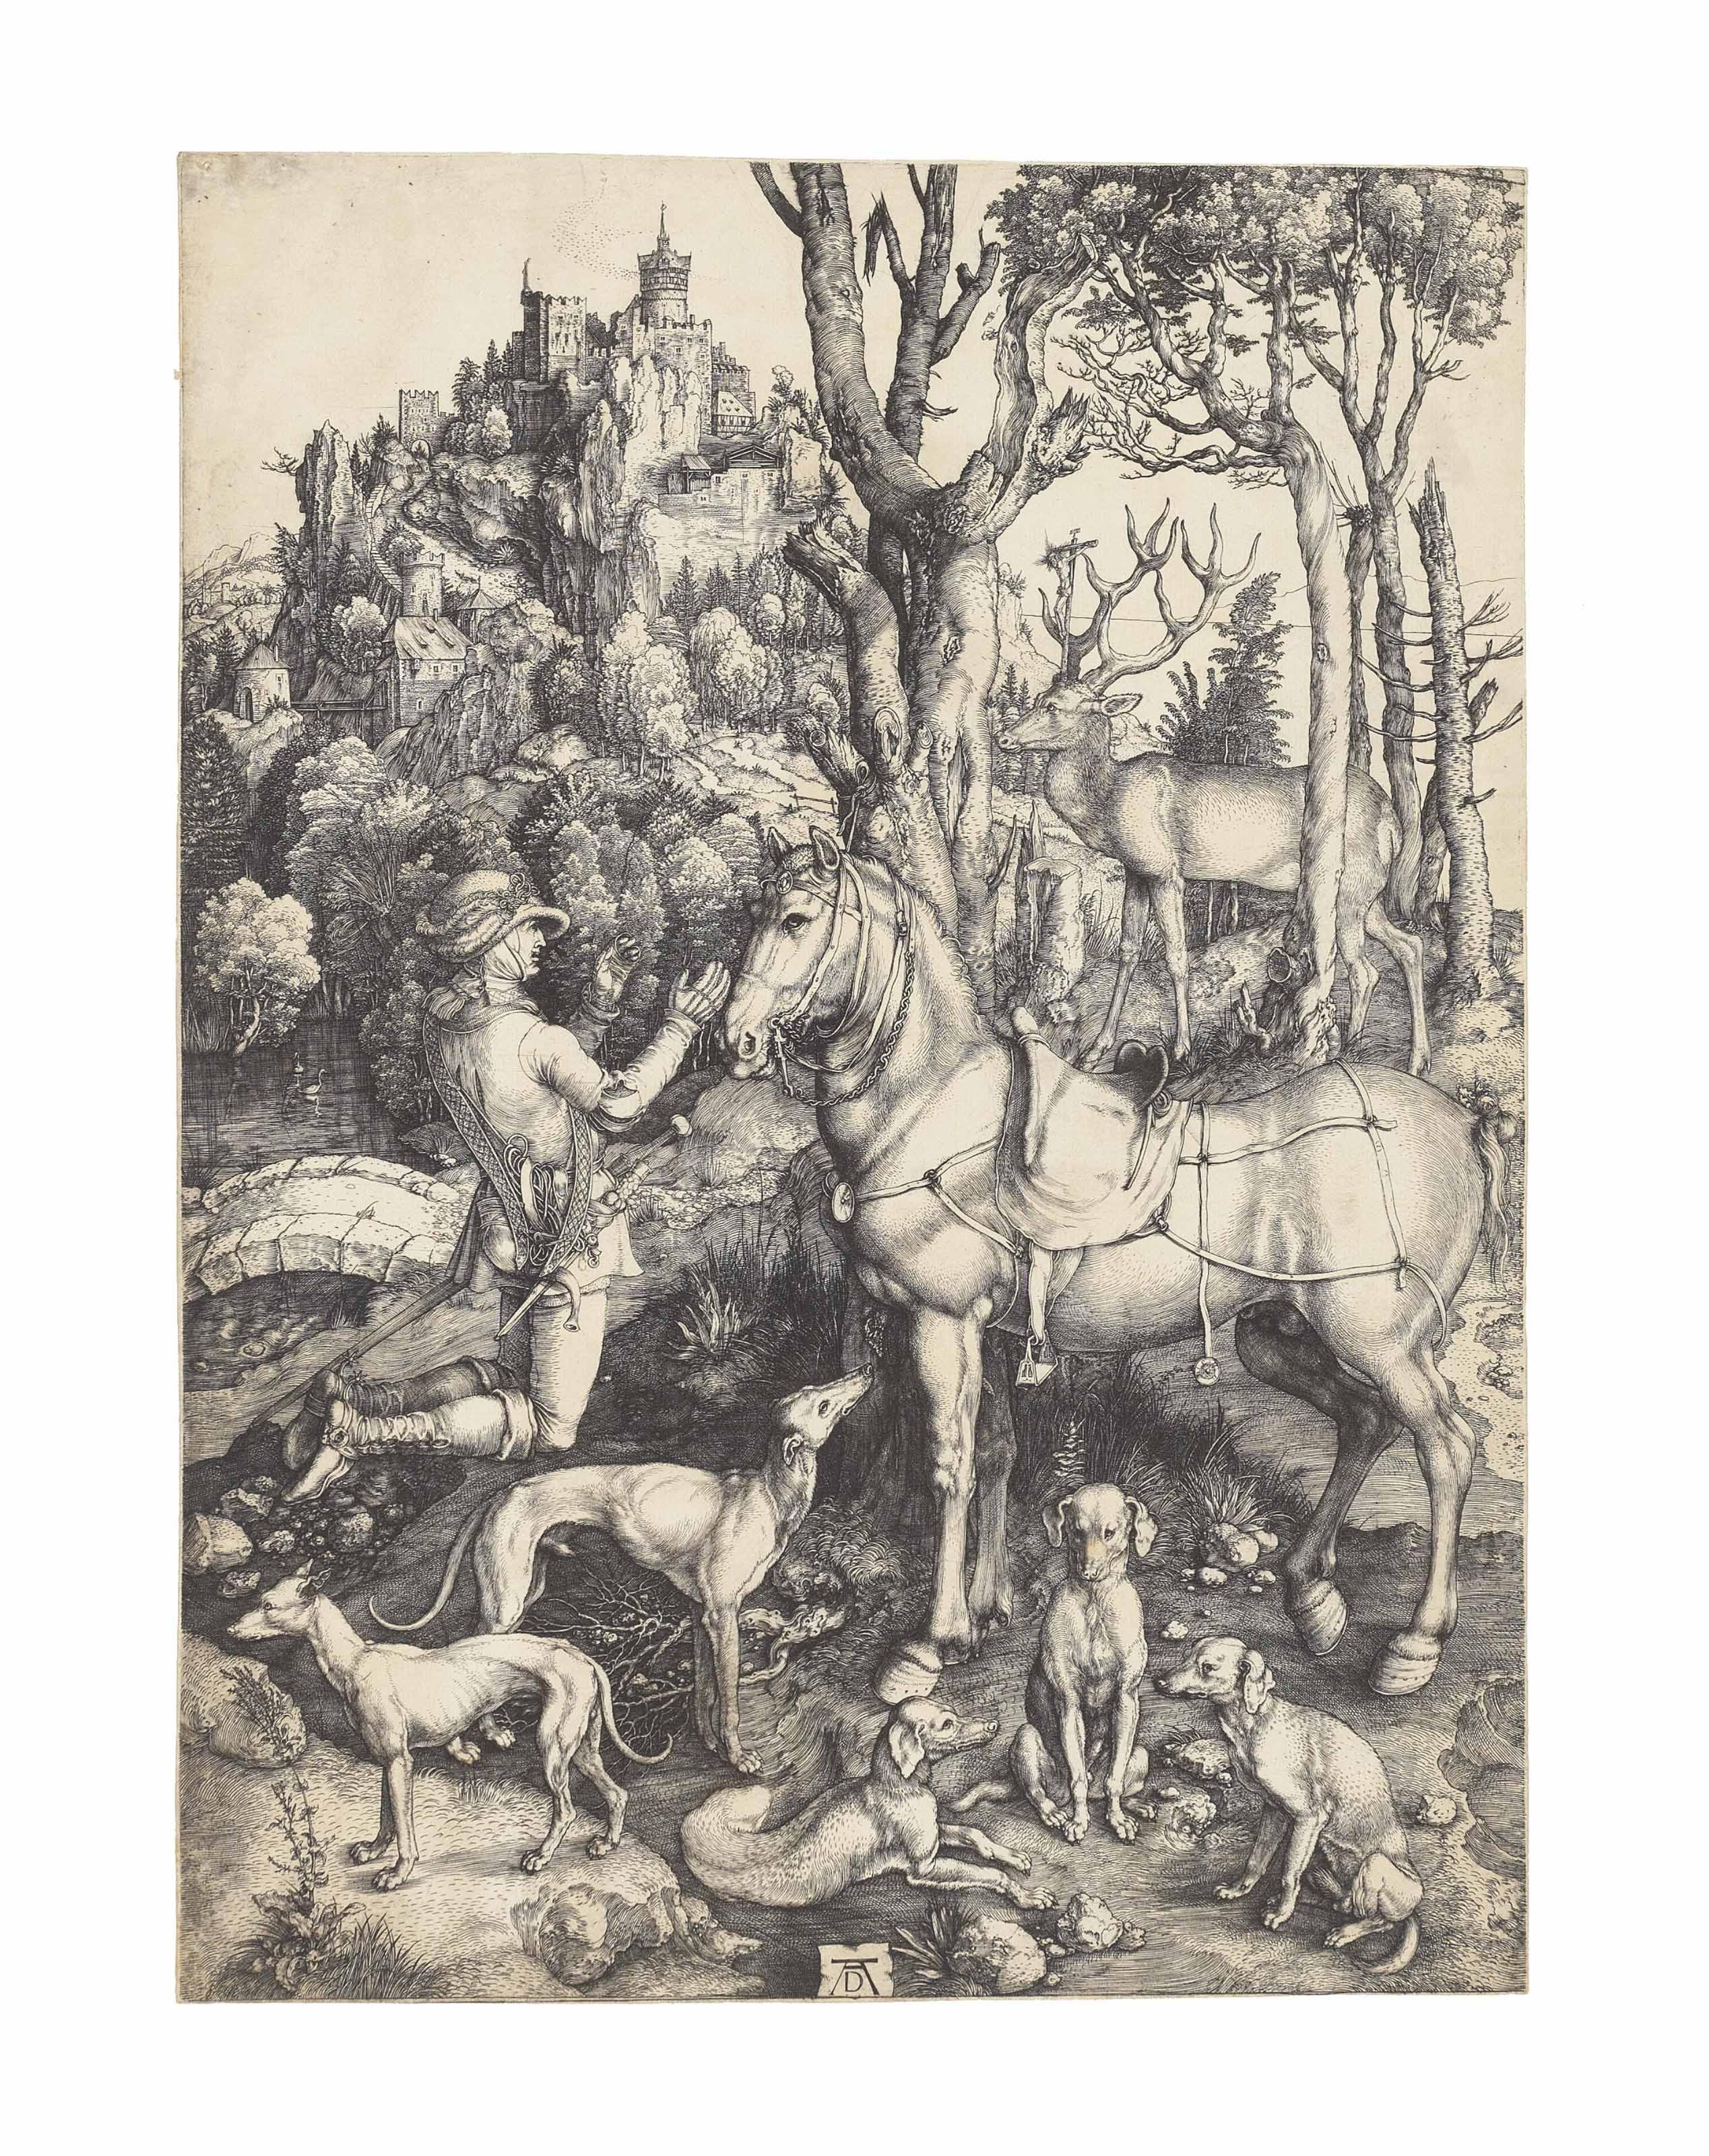 Saint Eustace (B. 57; M., Holl. 60; S.M.S. 32)